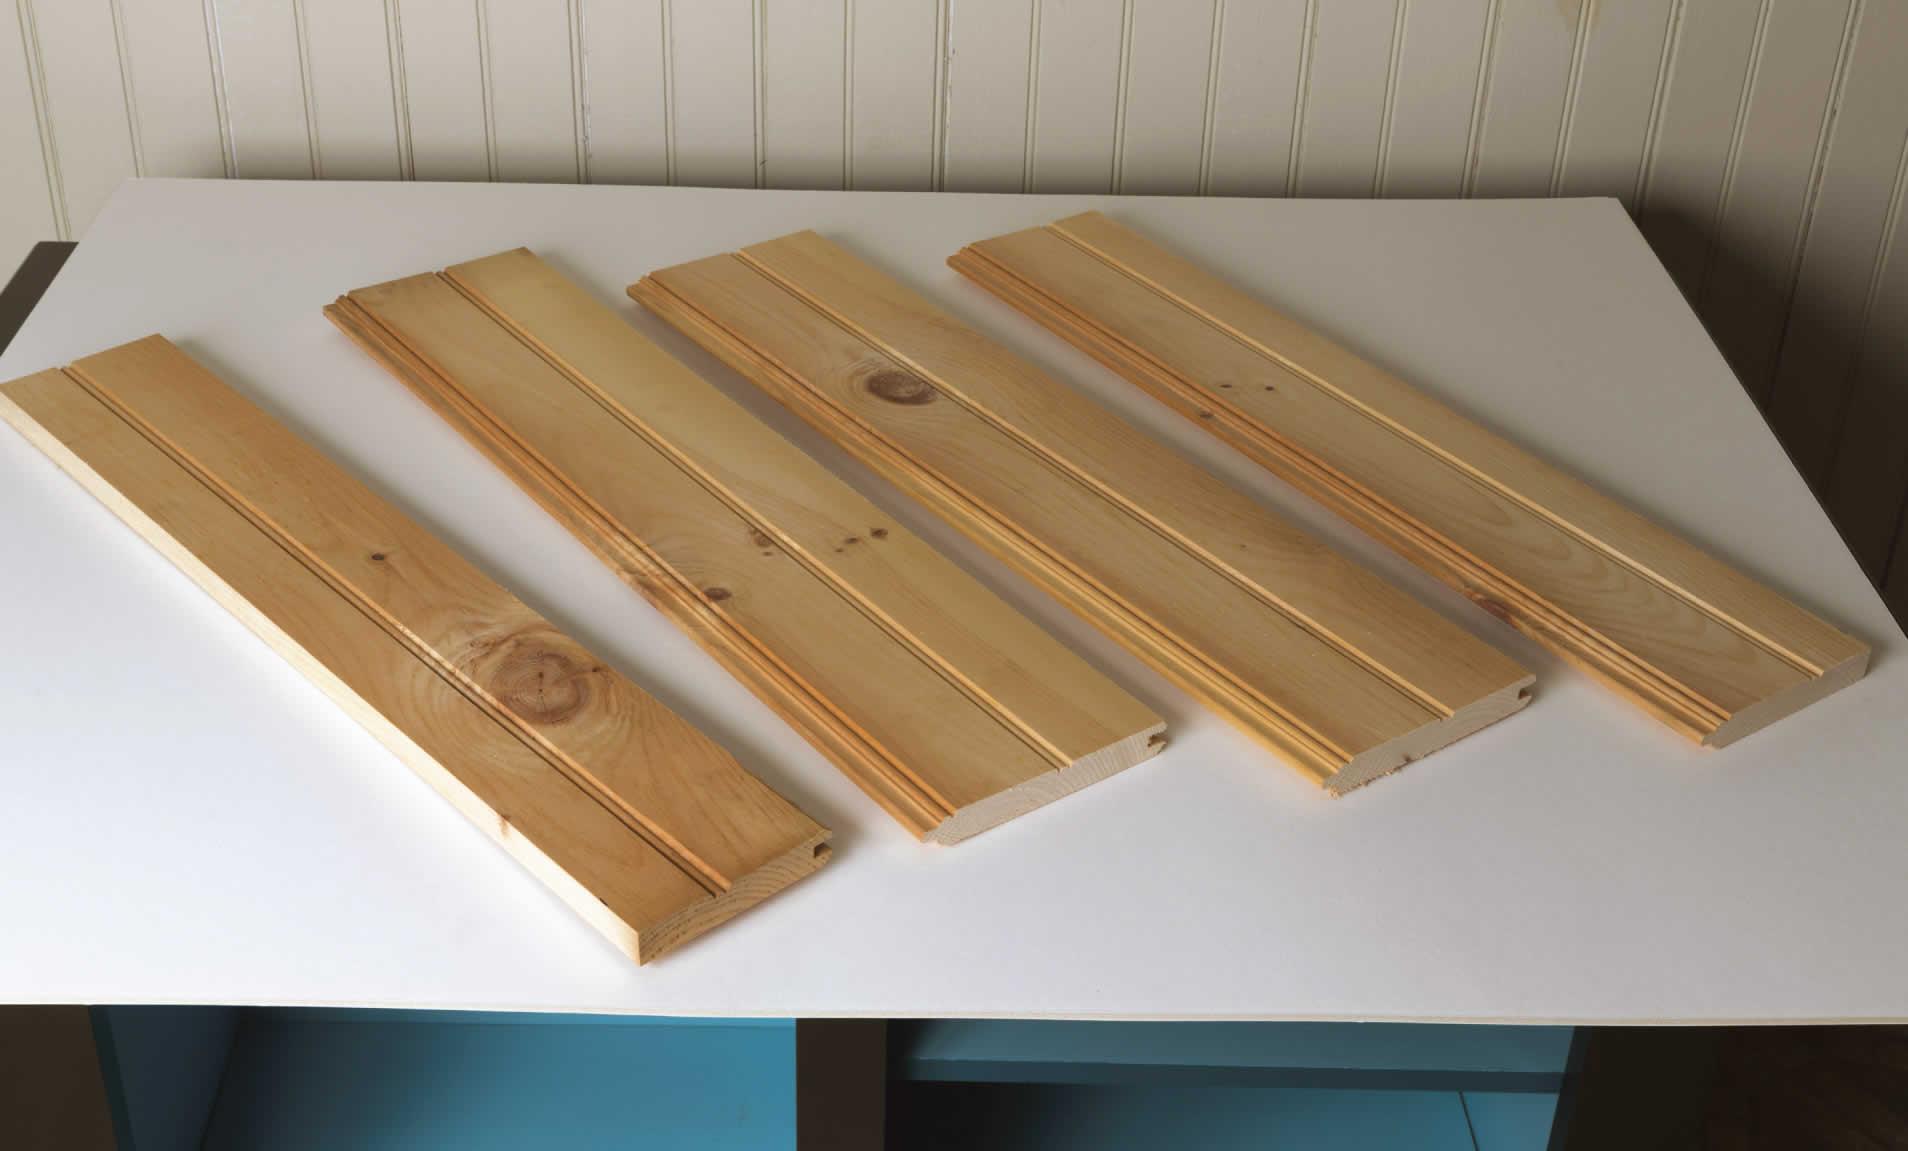 sliding-barn-door-cabinet-arrow-project-step4b.jpg